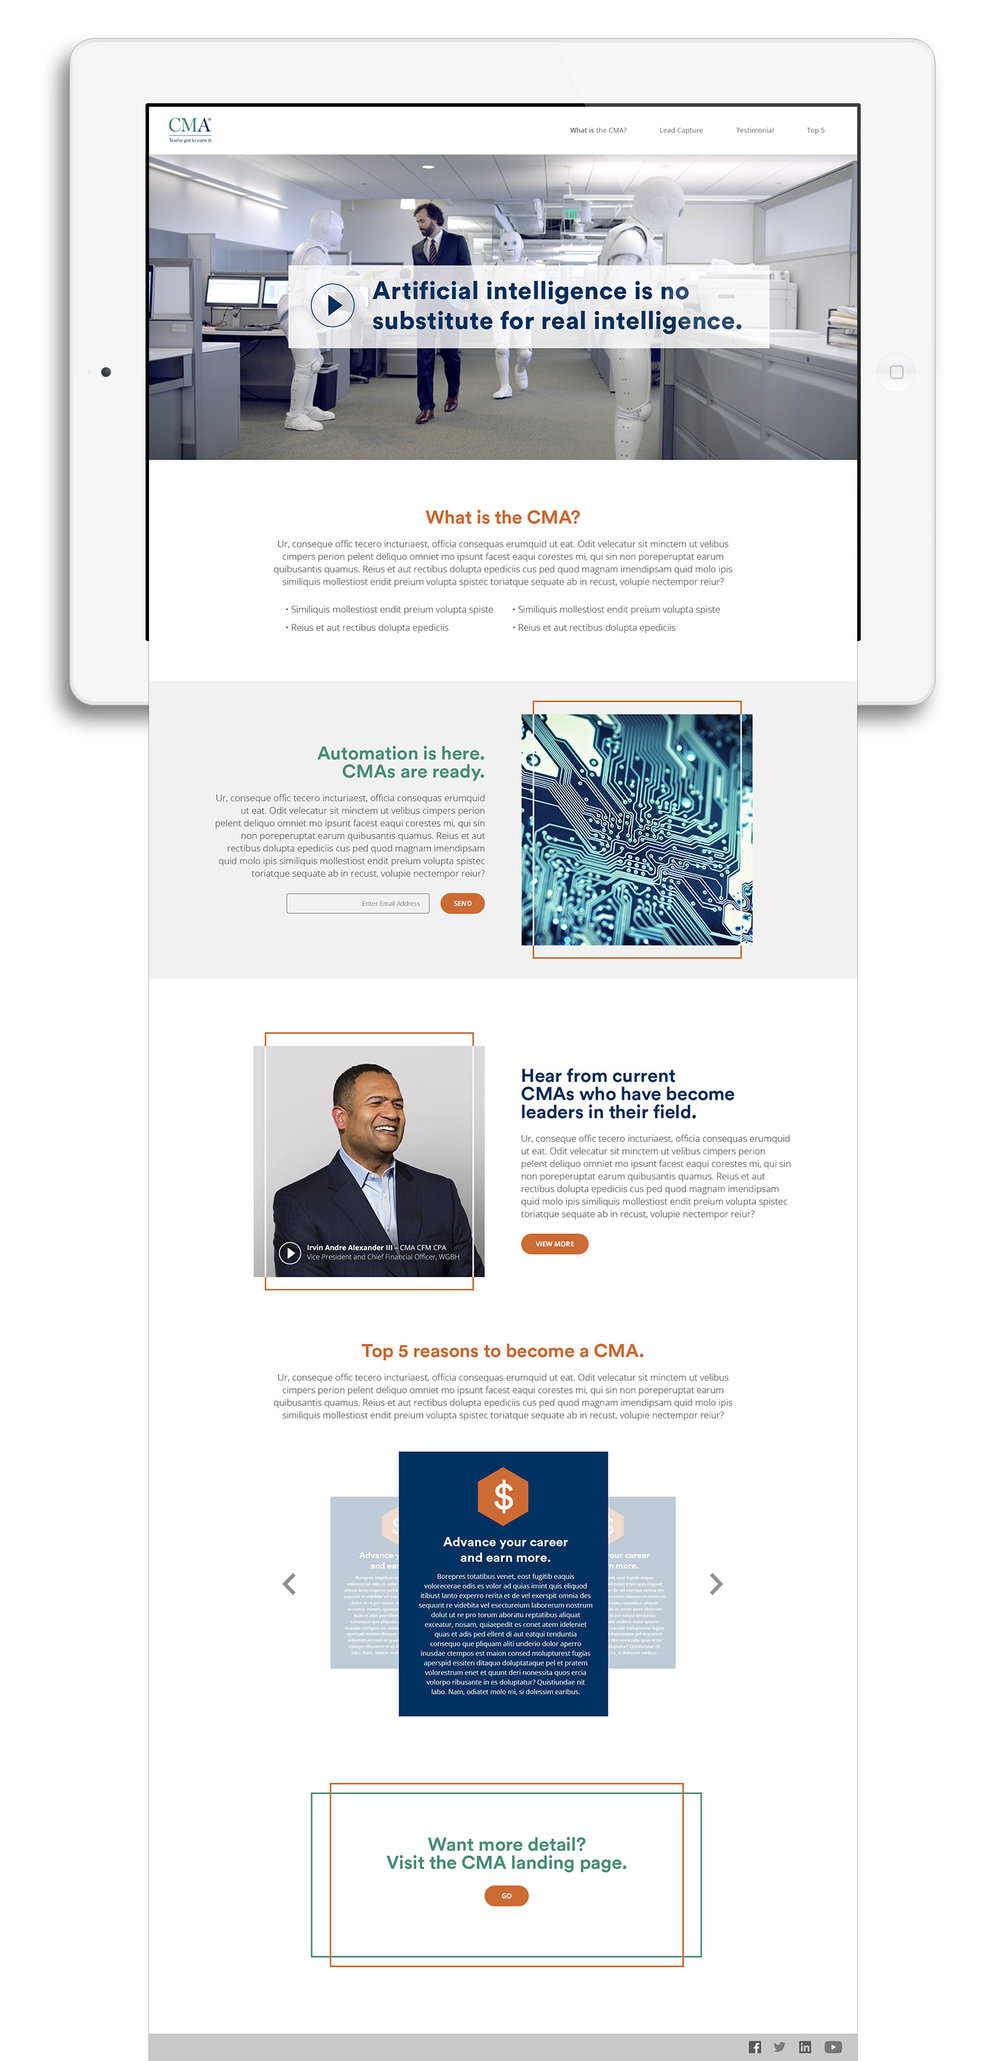 IMA_LandingPage_iPad.jpg